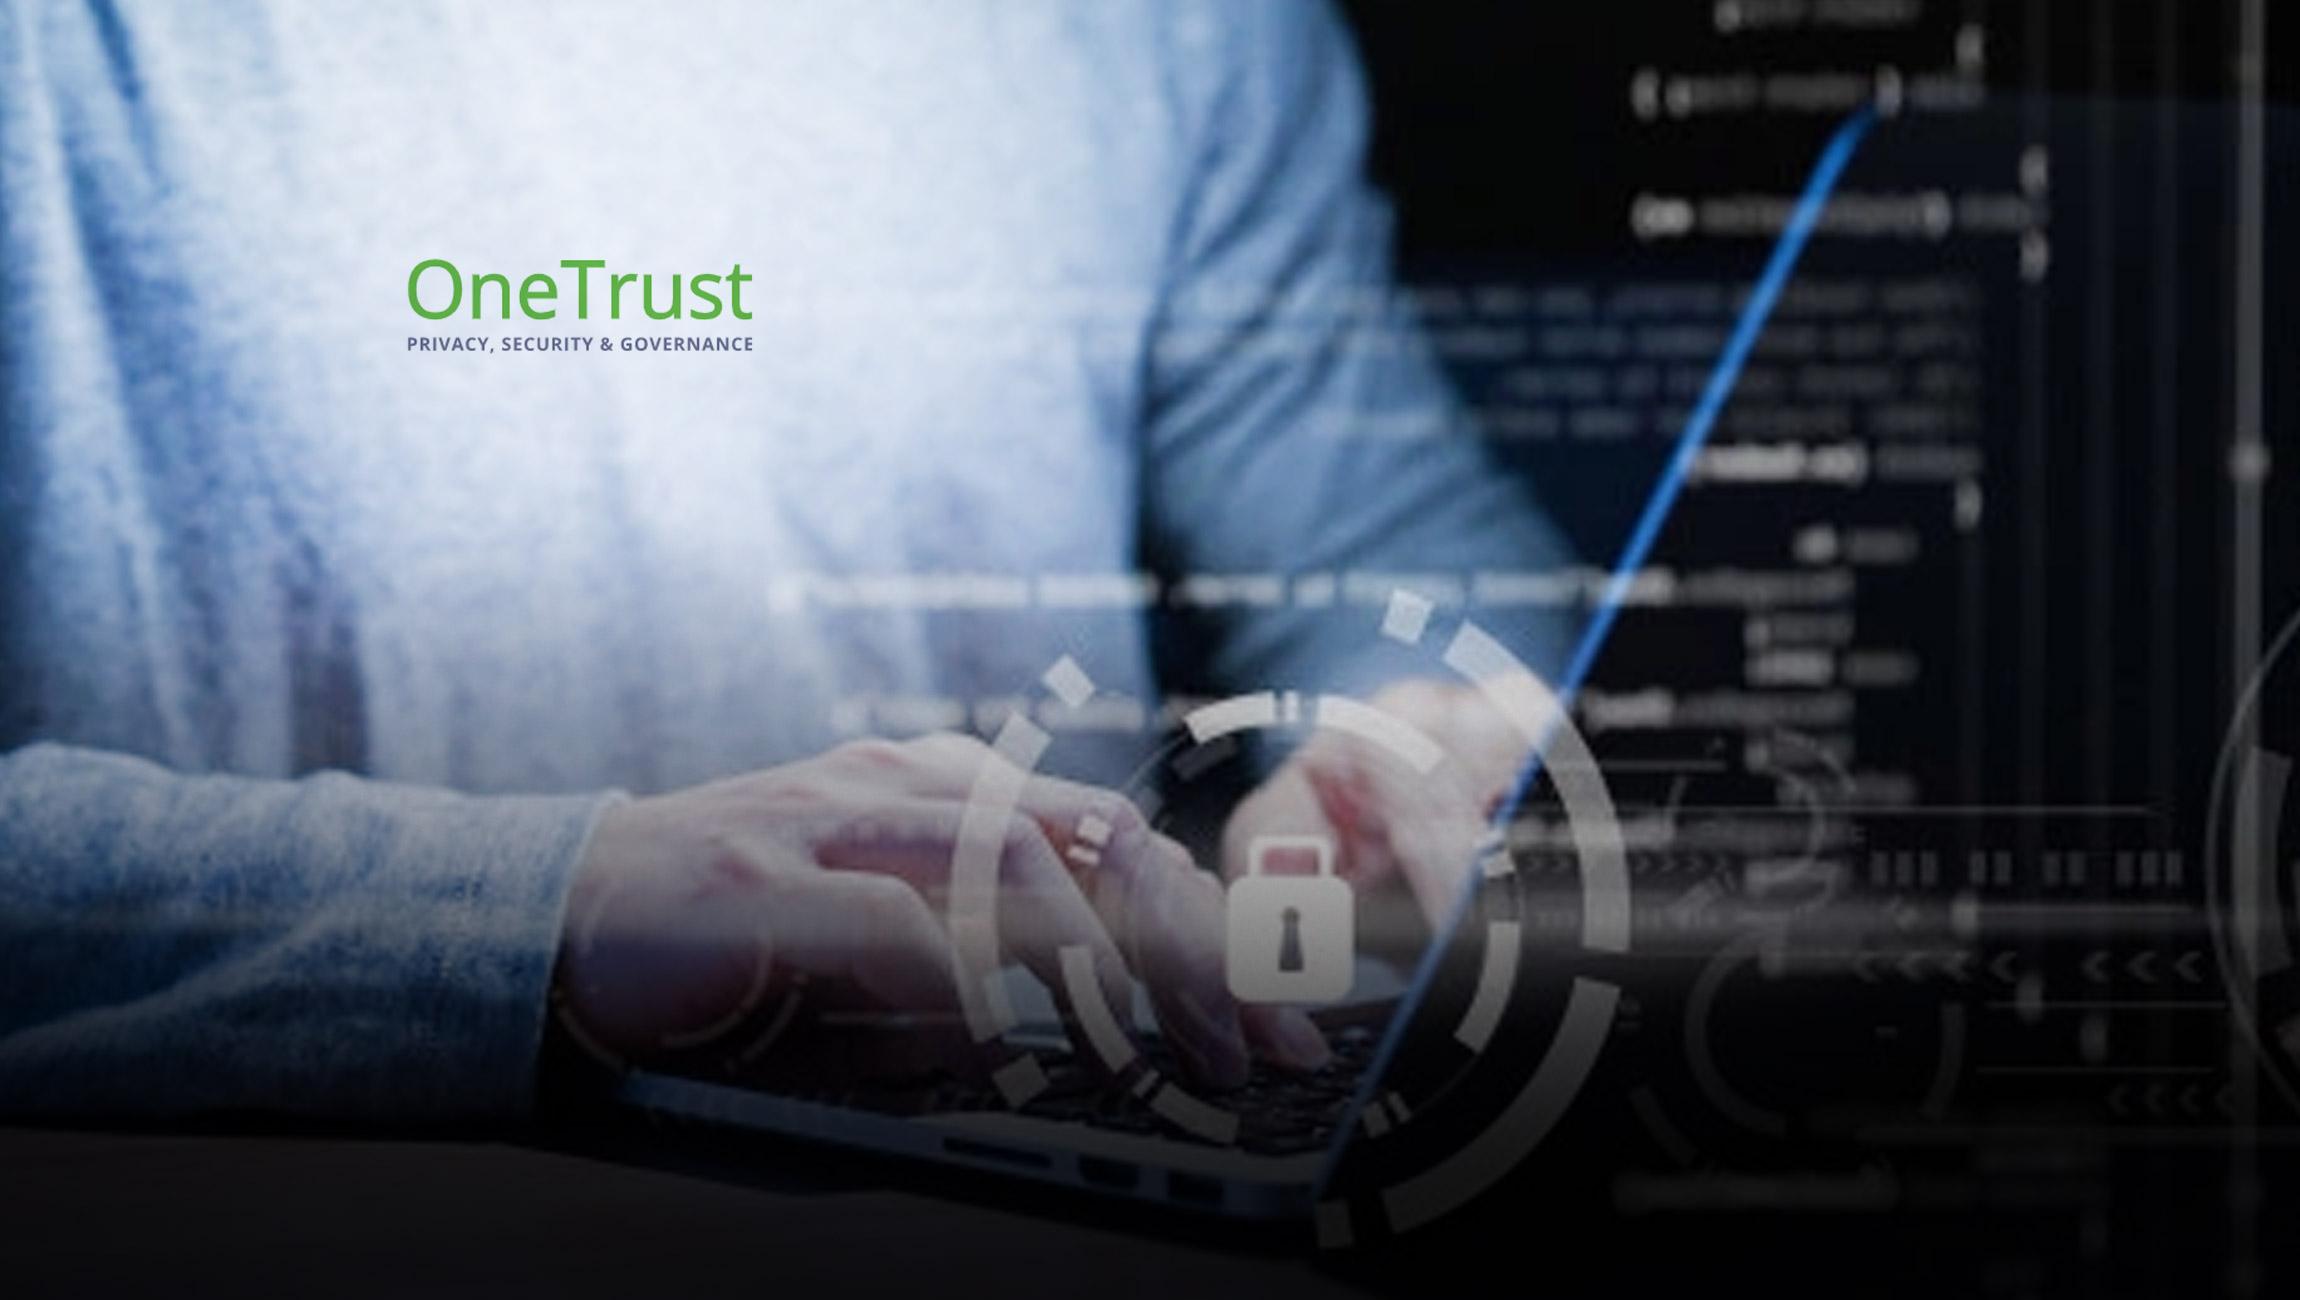 OneTrust Celebrates Five Year Milestone Helping 10,000 Customers Build Trusted Organizations